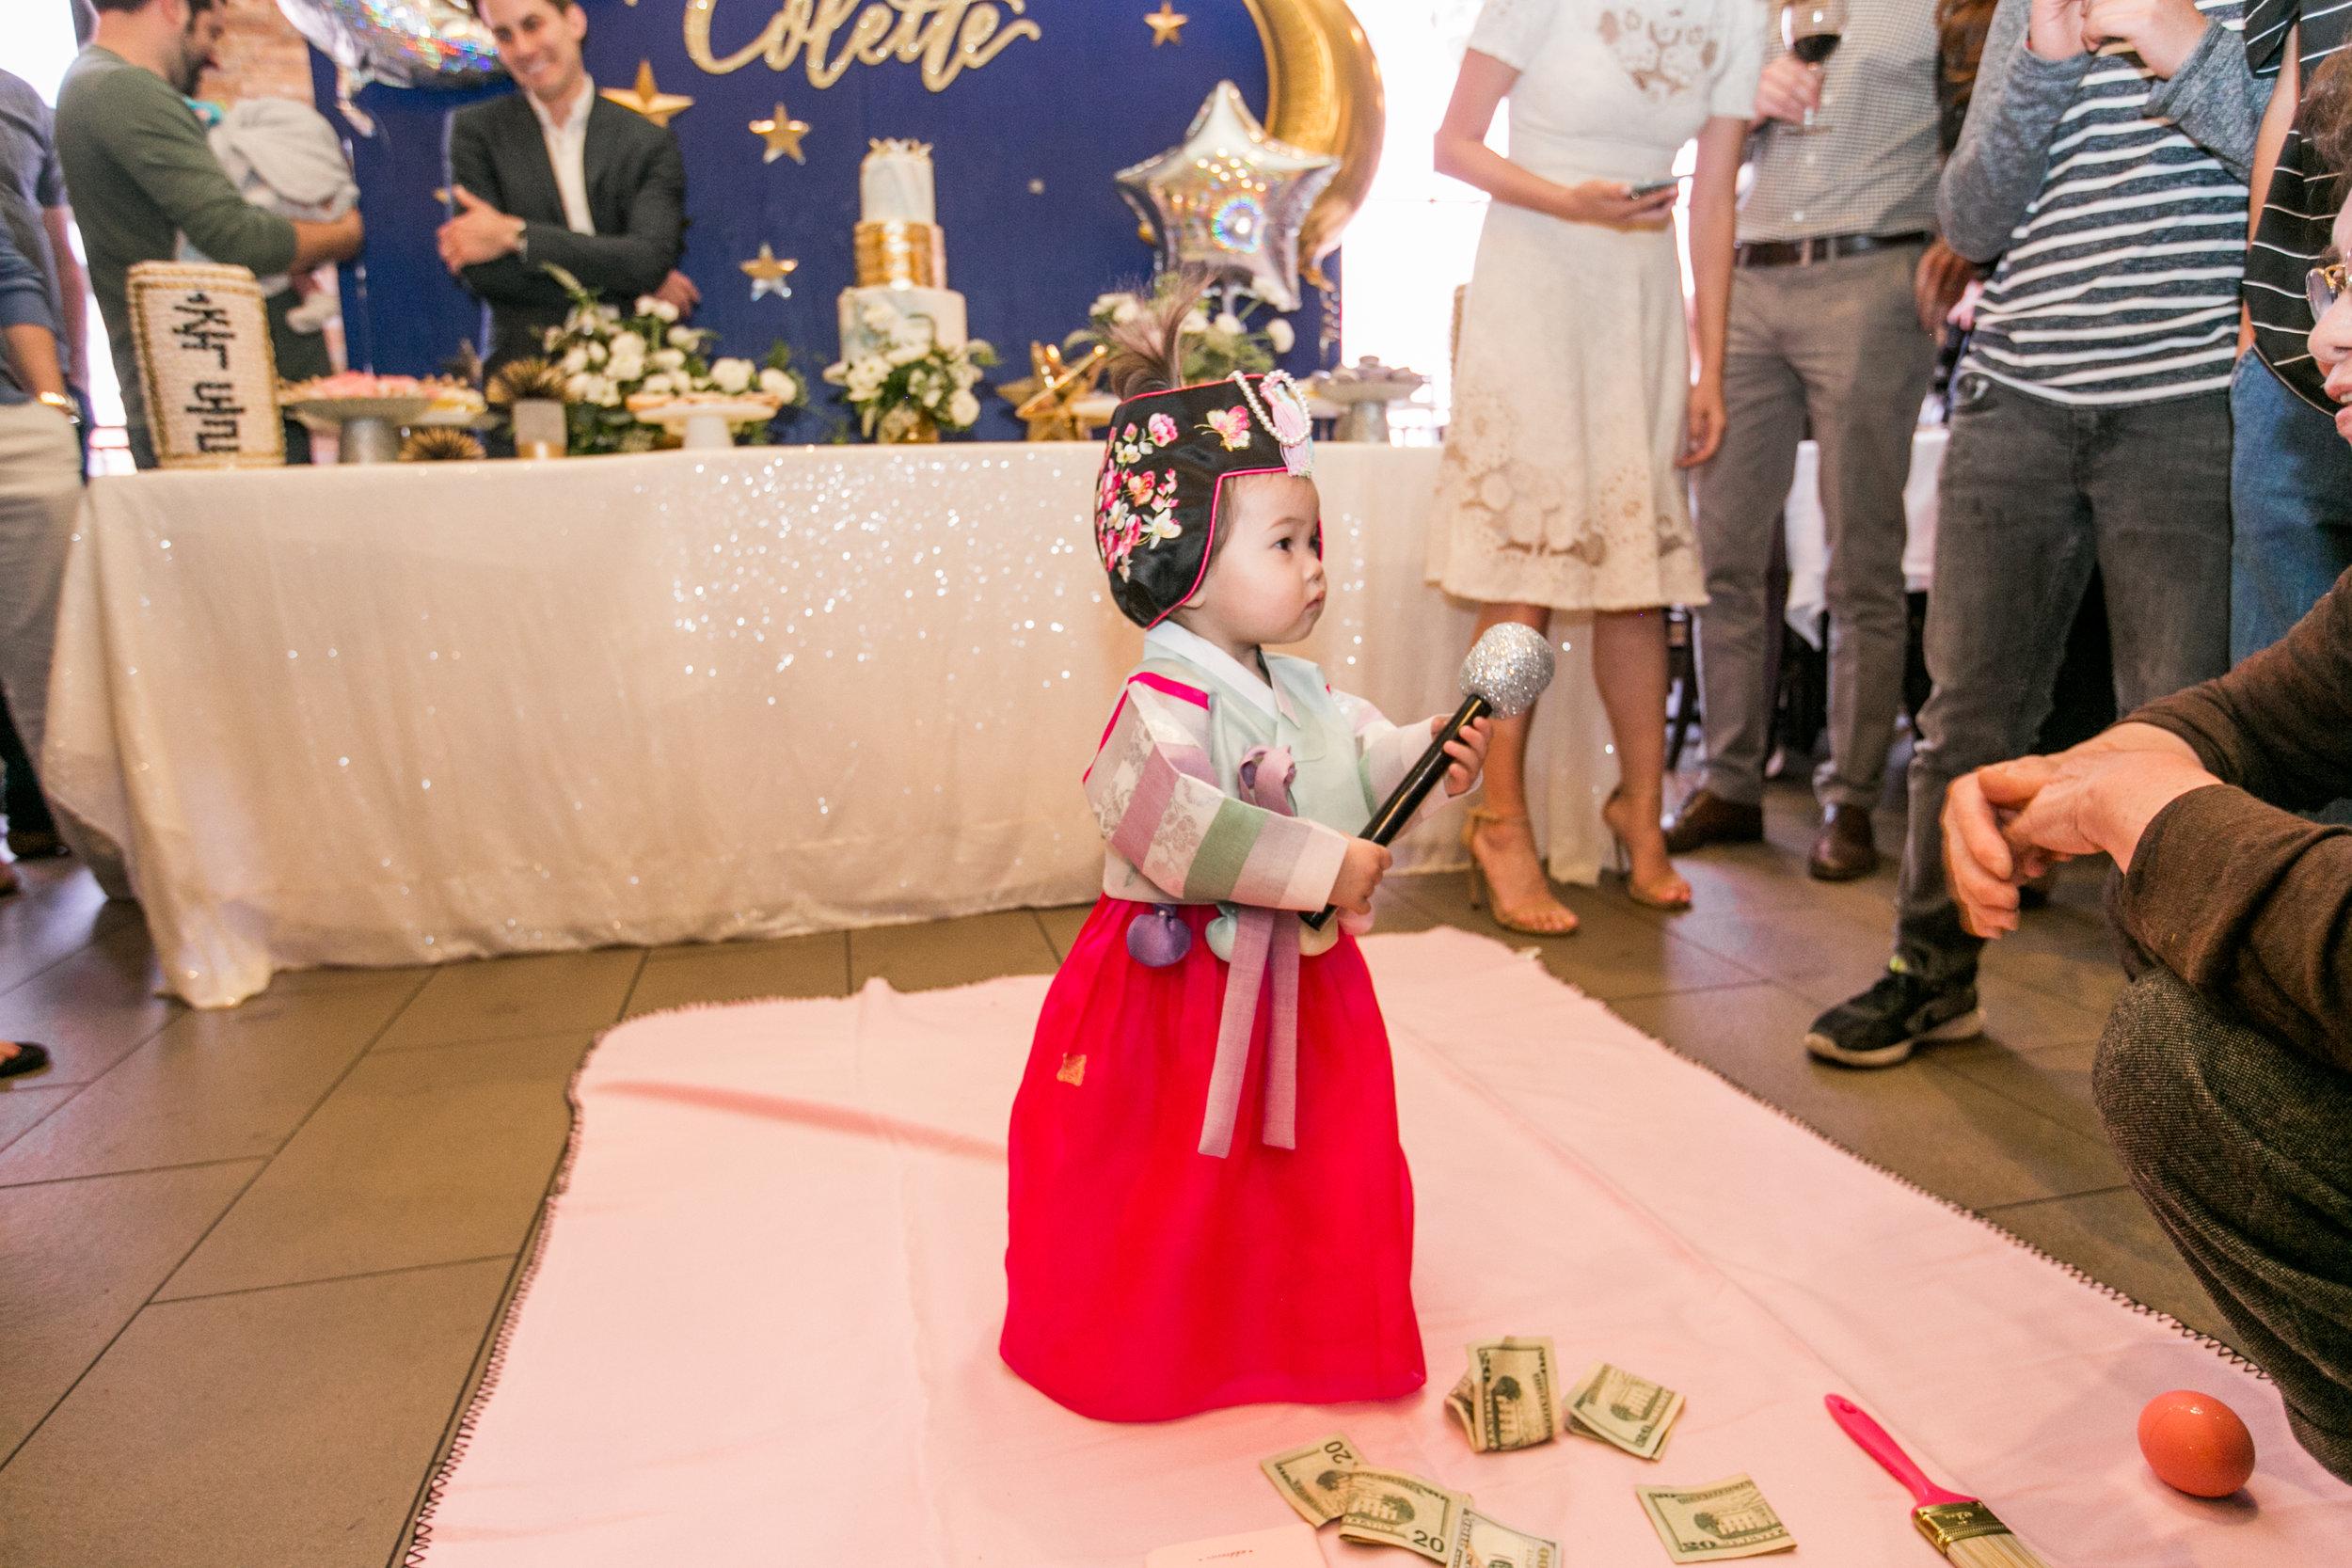 Korean traditional birthday party